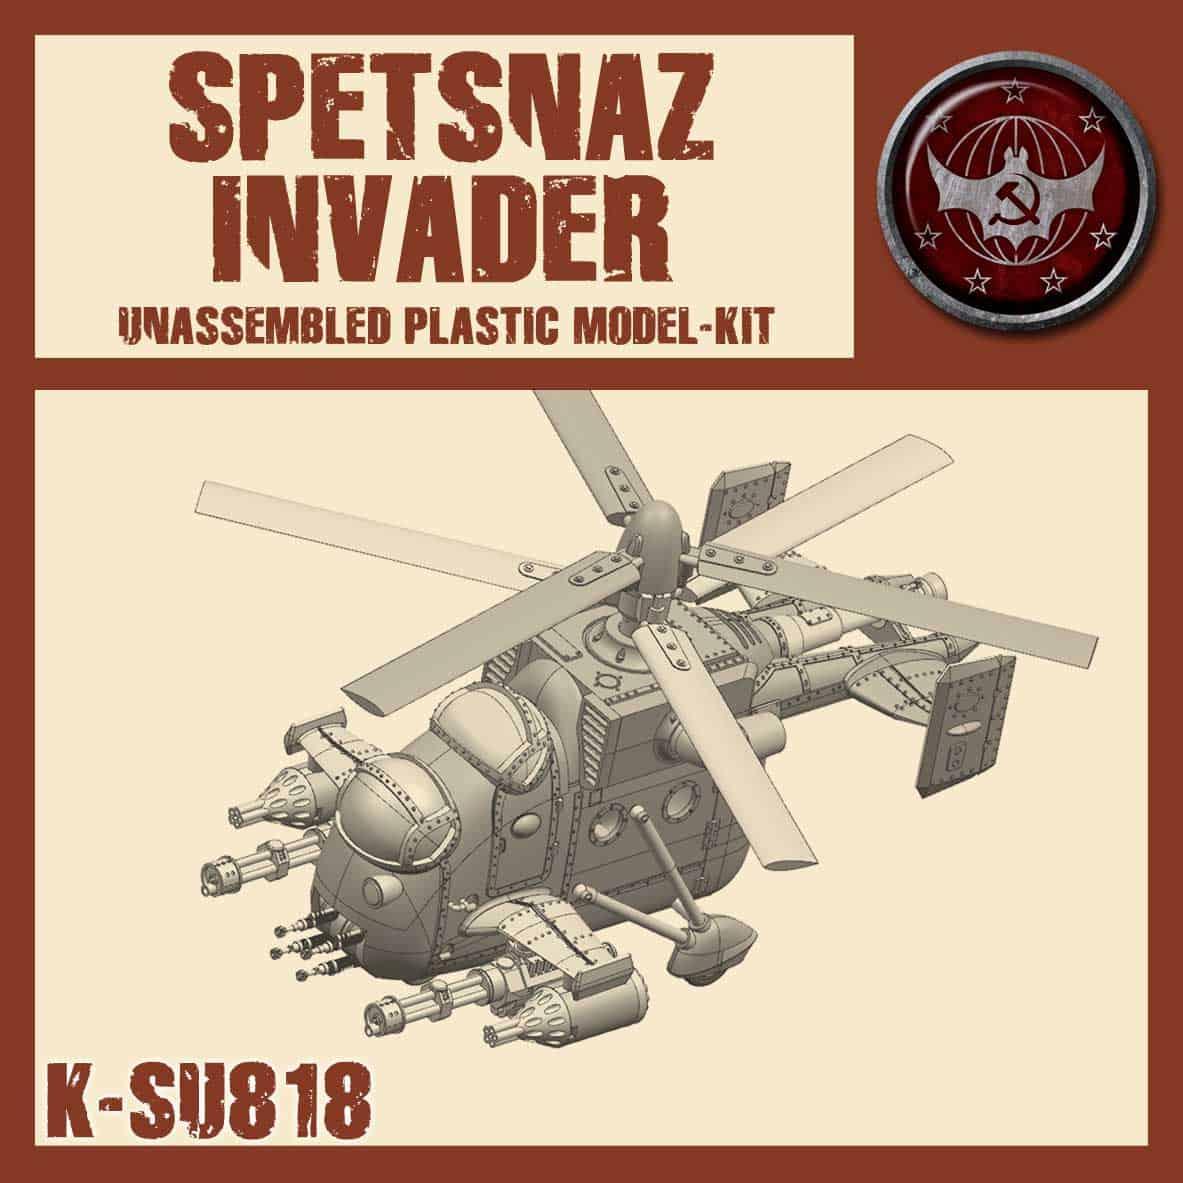 Invader Kit